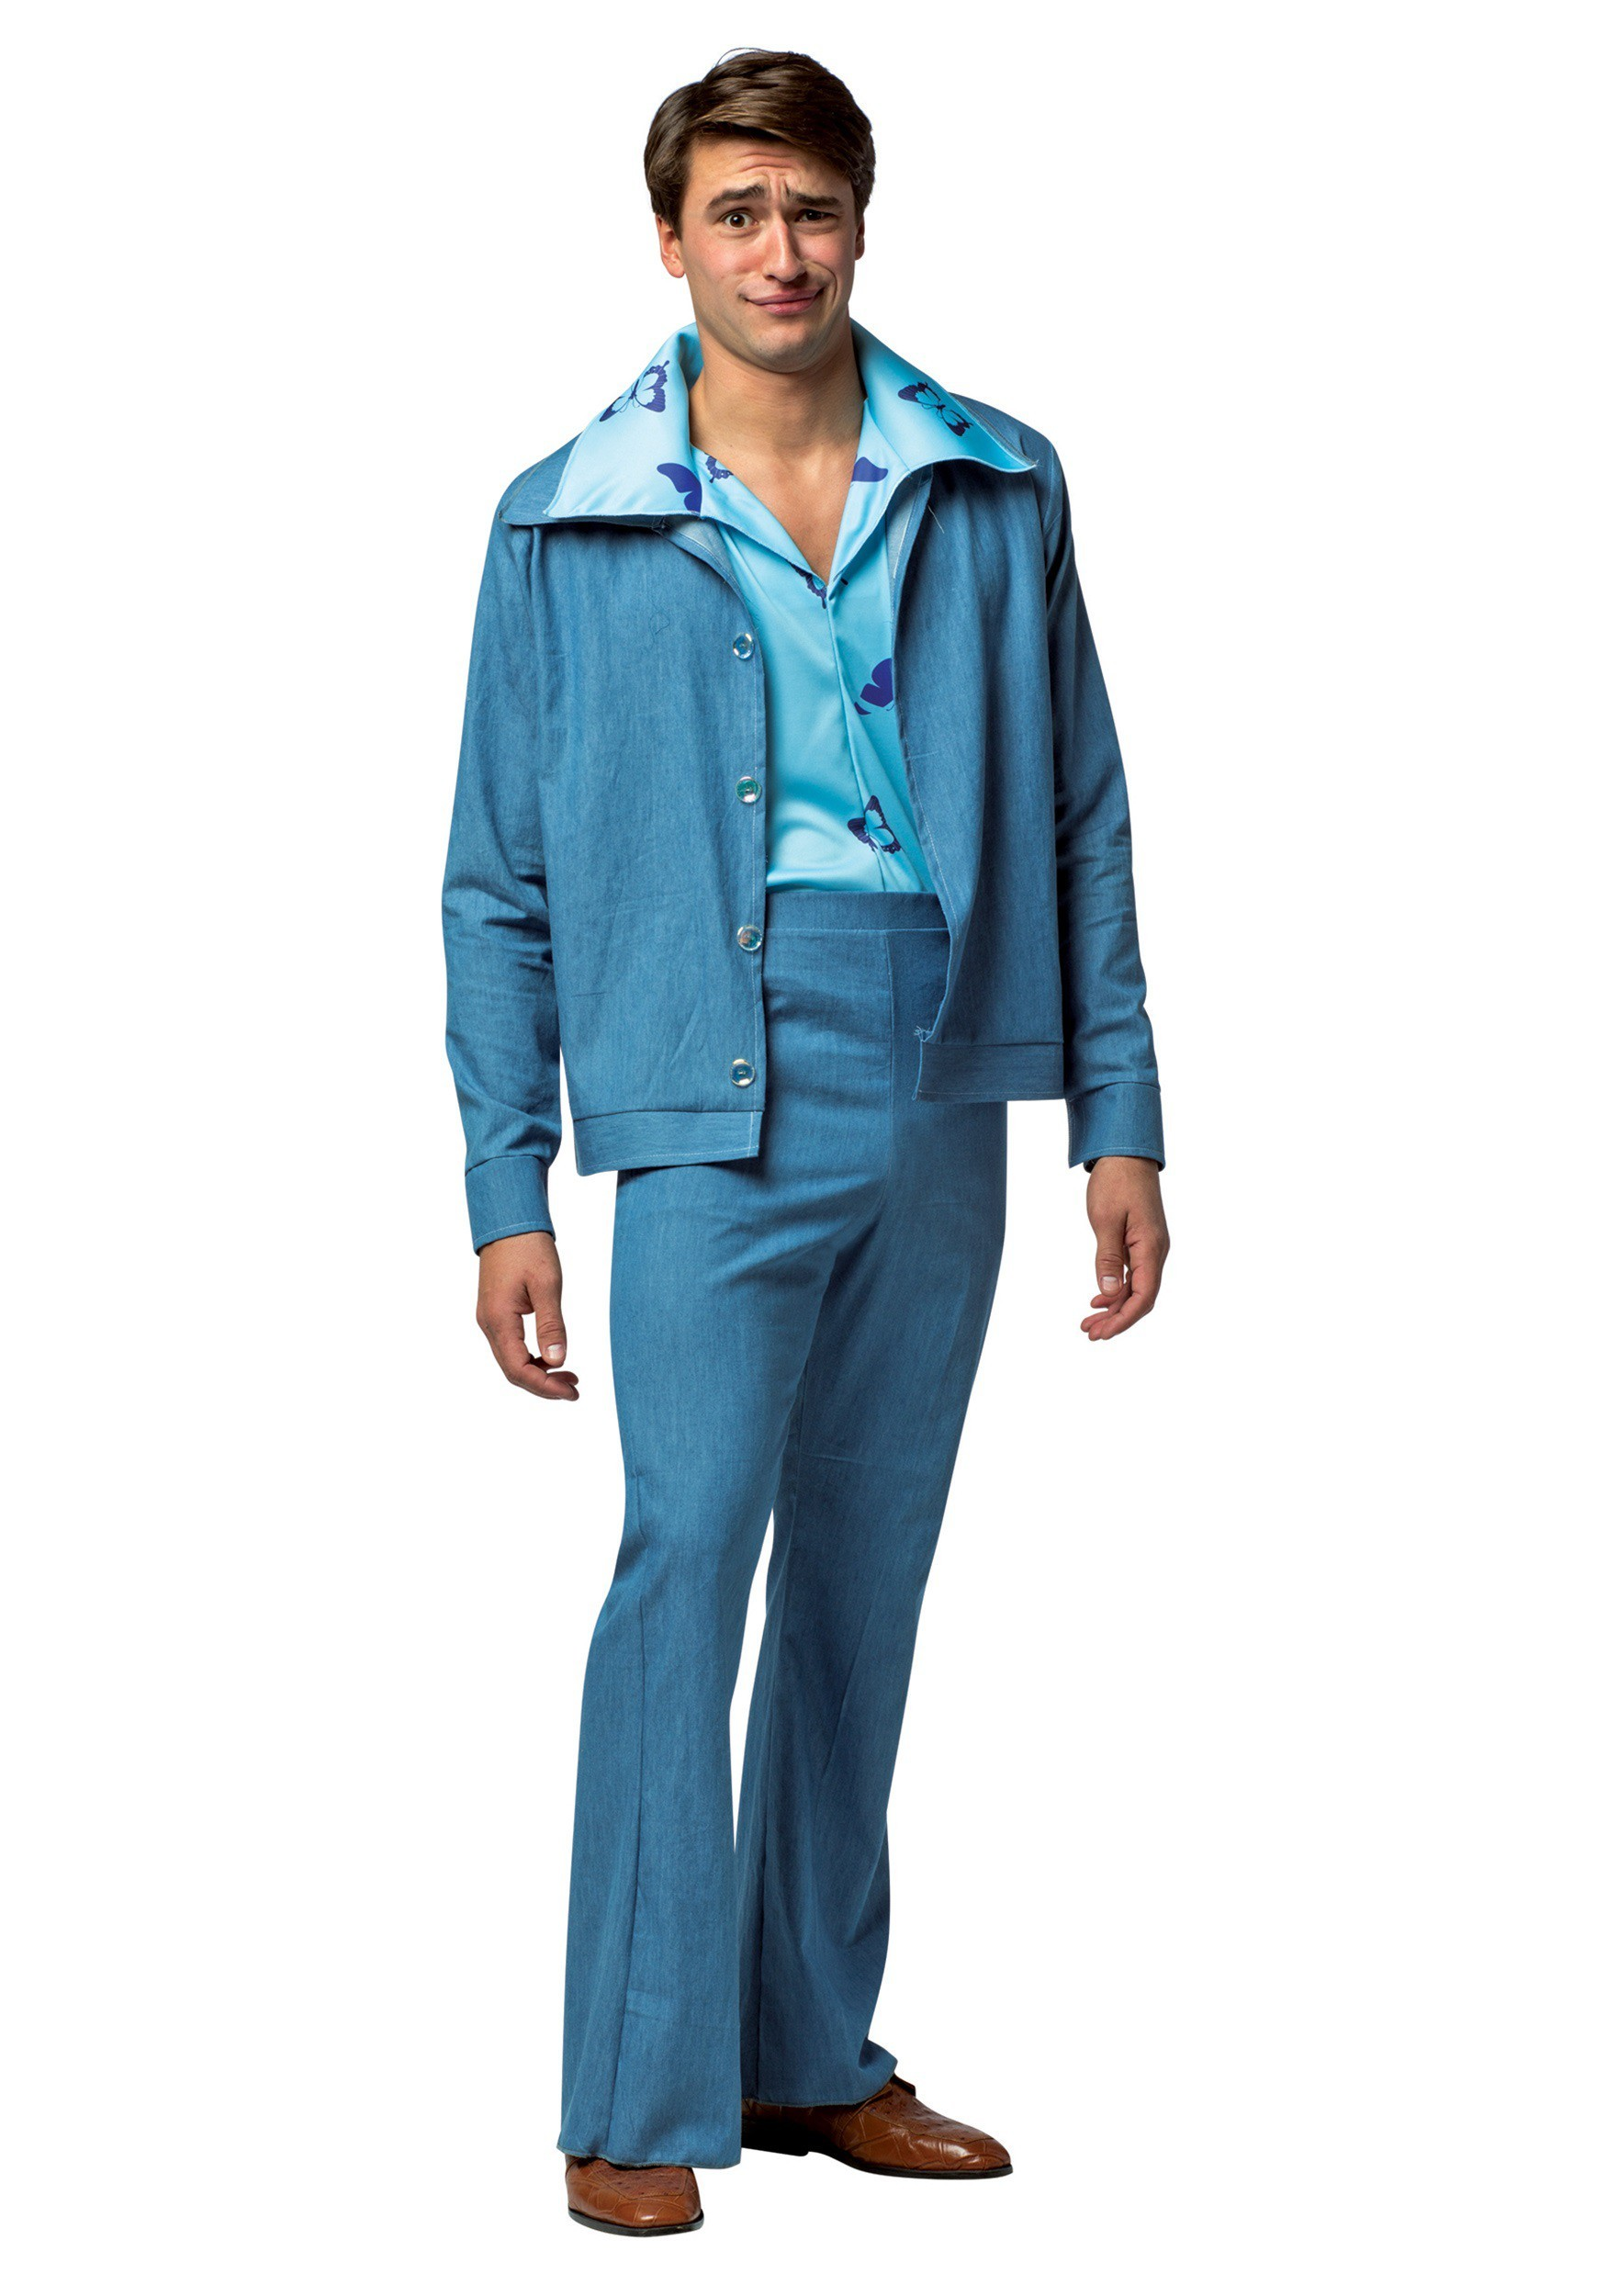 National Lampoons Cousin Eddie Leisure Suit